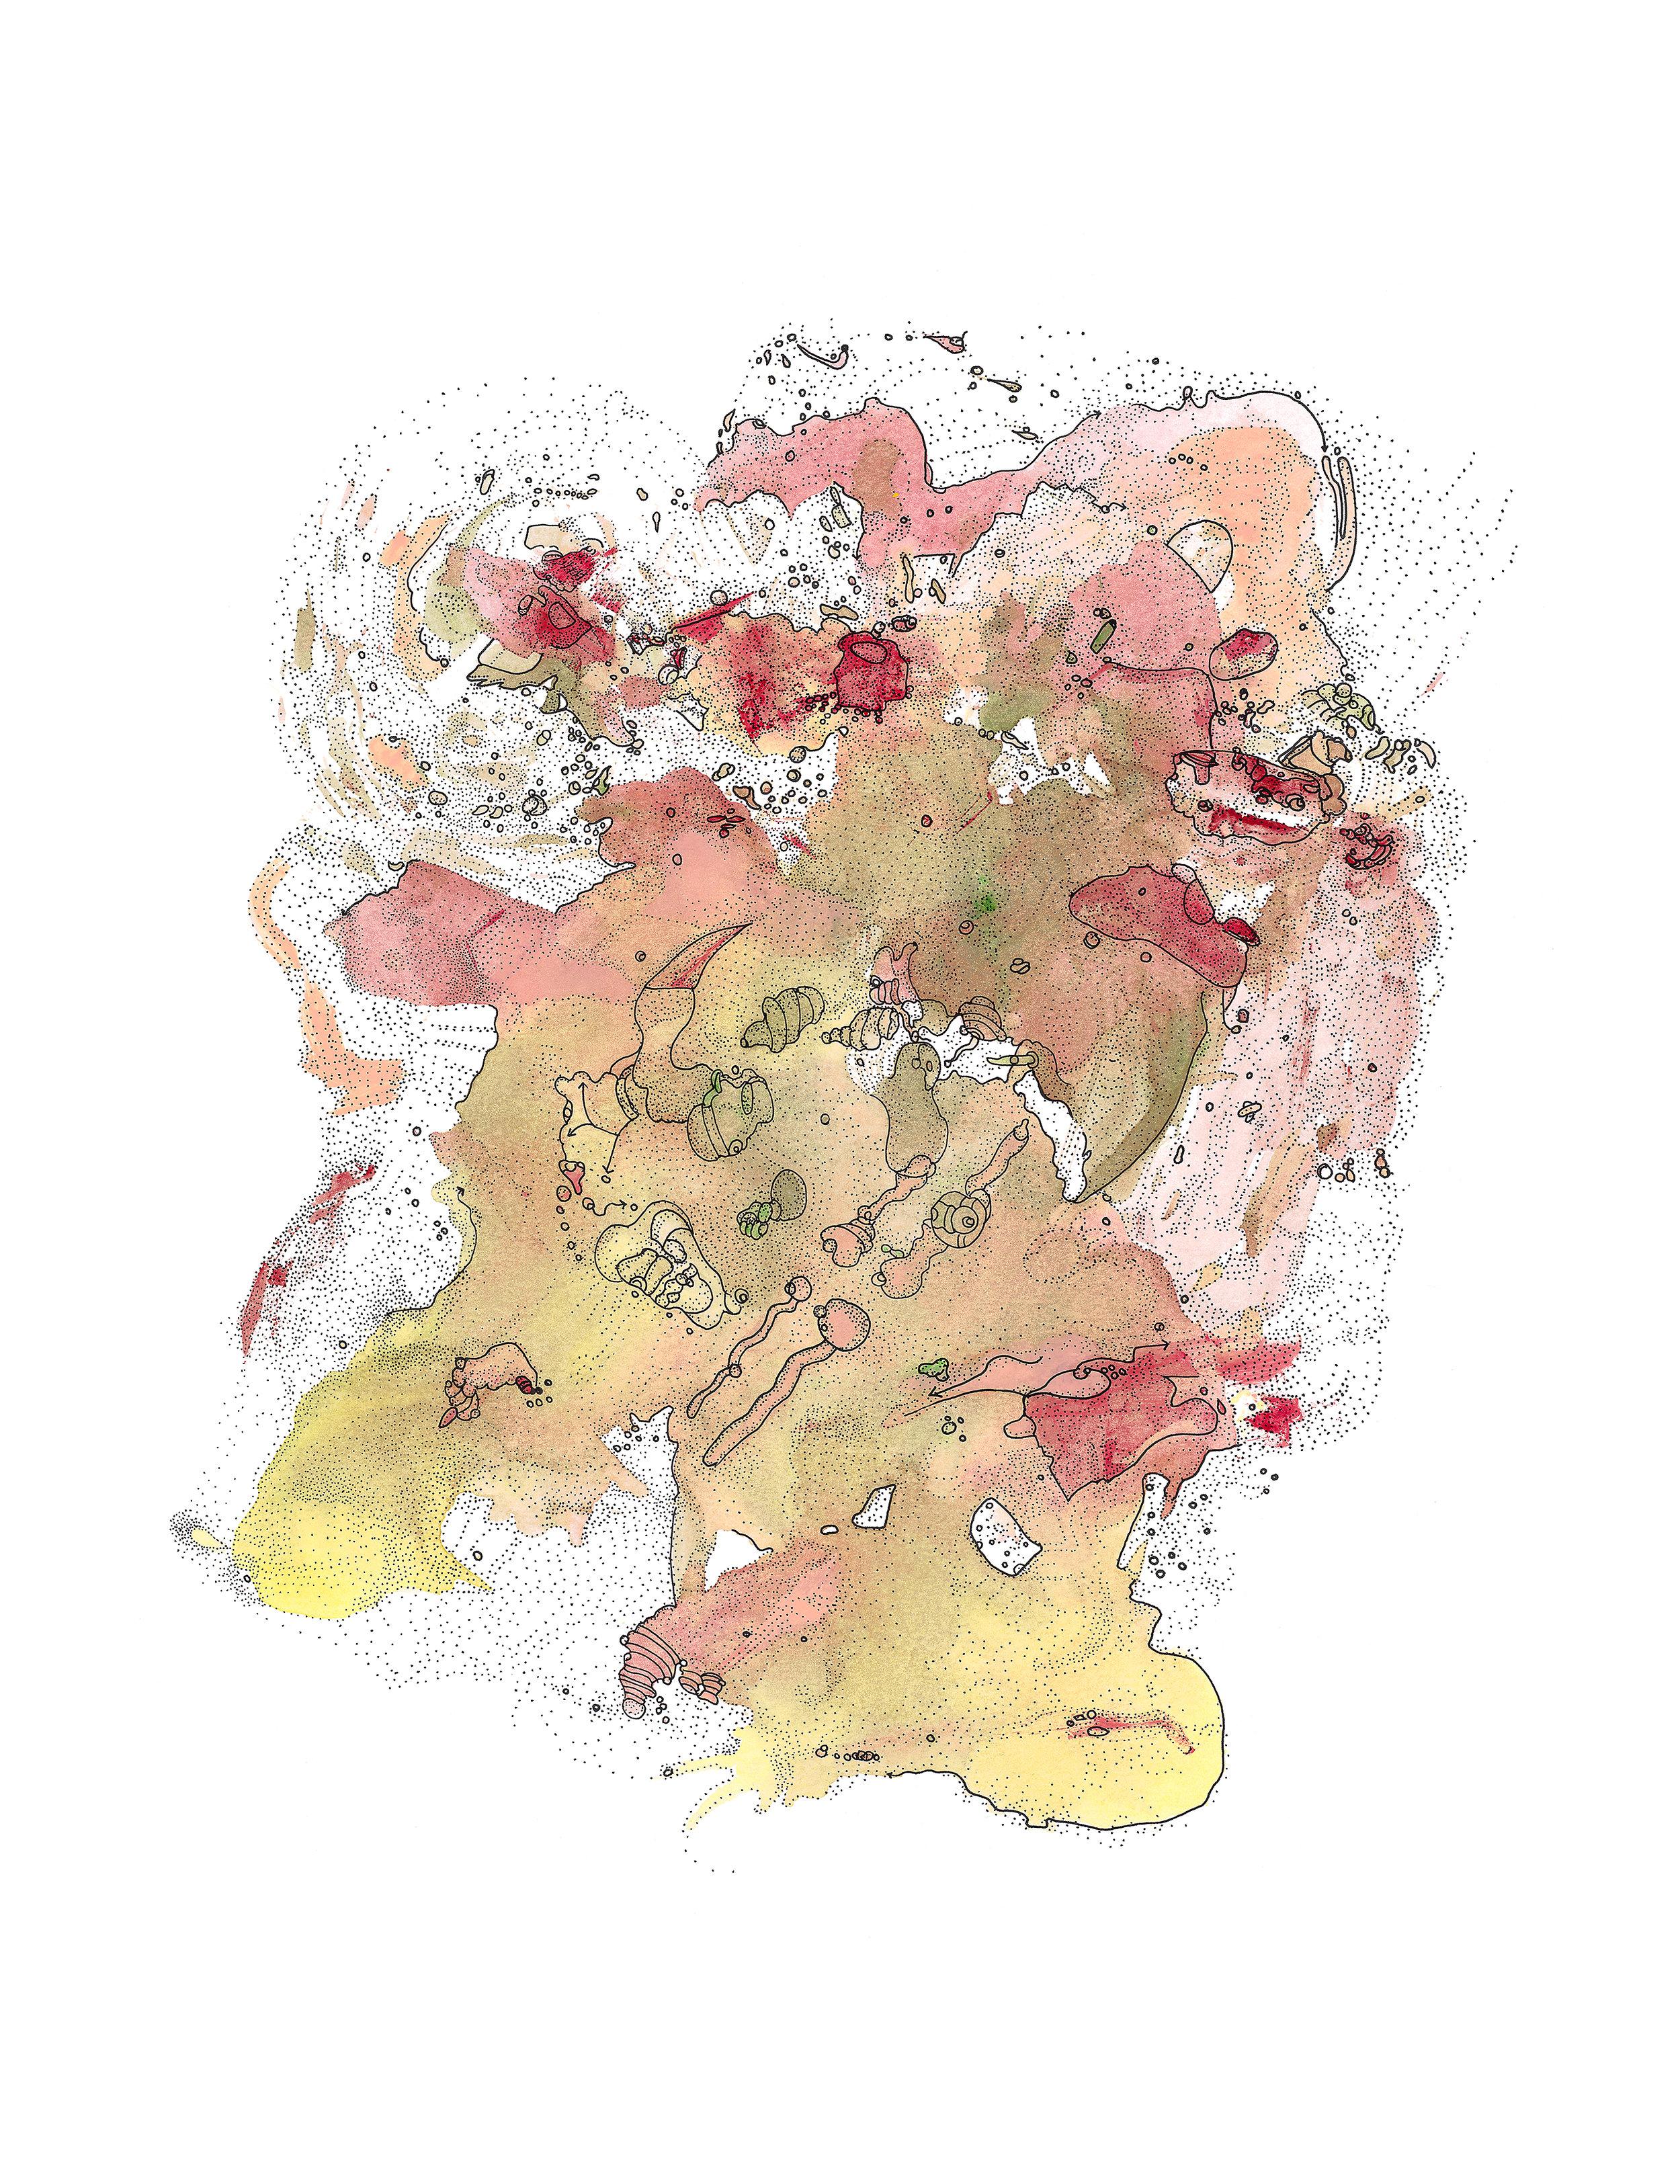 RogelioMaxwell-CellMigration-2009-ArchivalPigmentPrint-18x24-$500.jpg